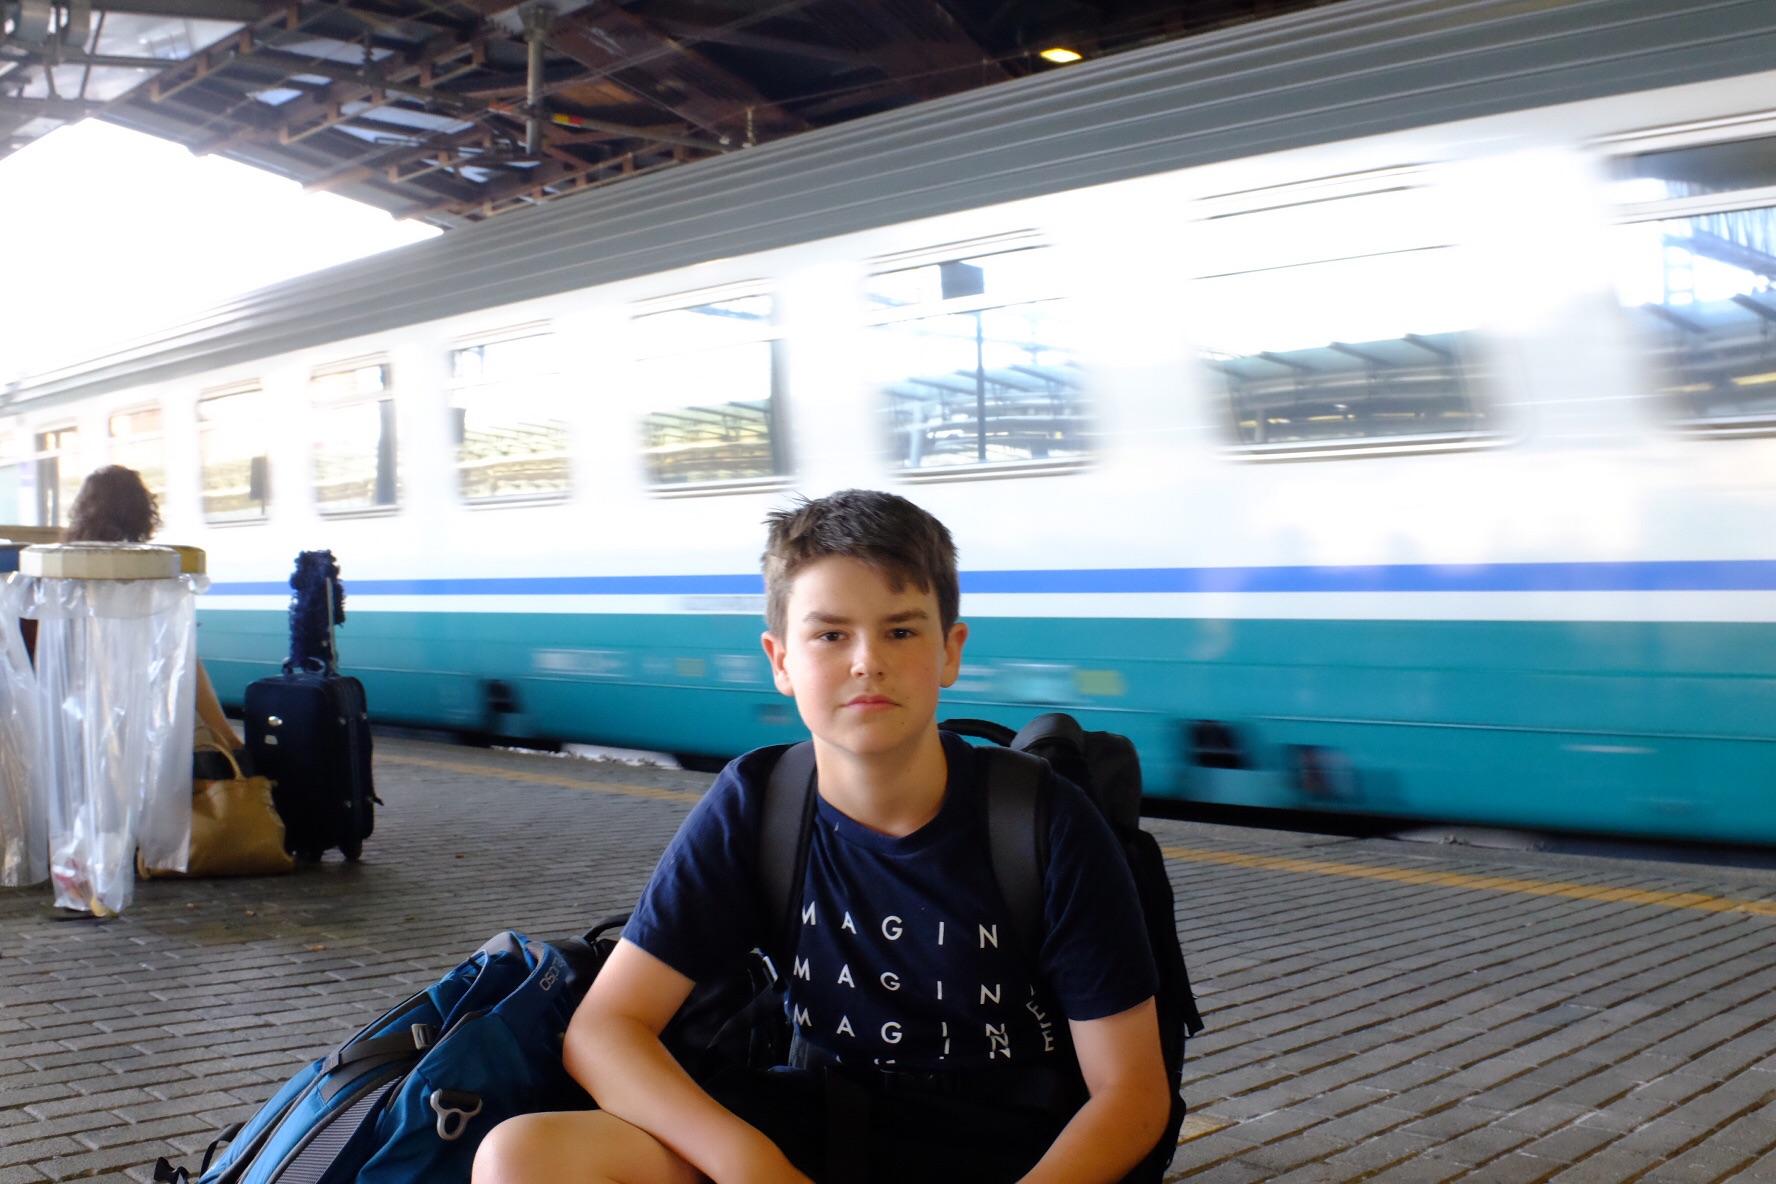 Waiting for our train at Tiburtina